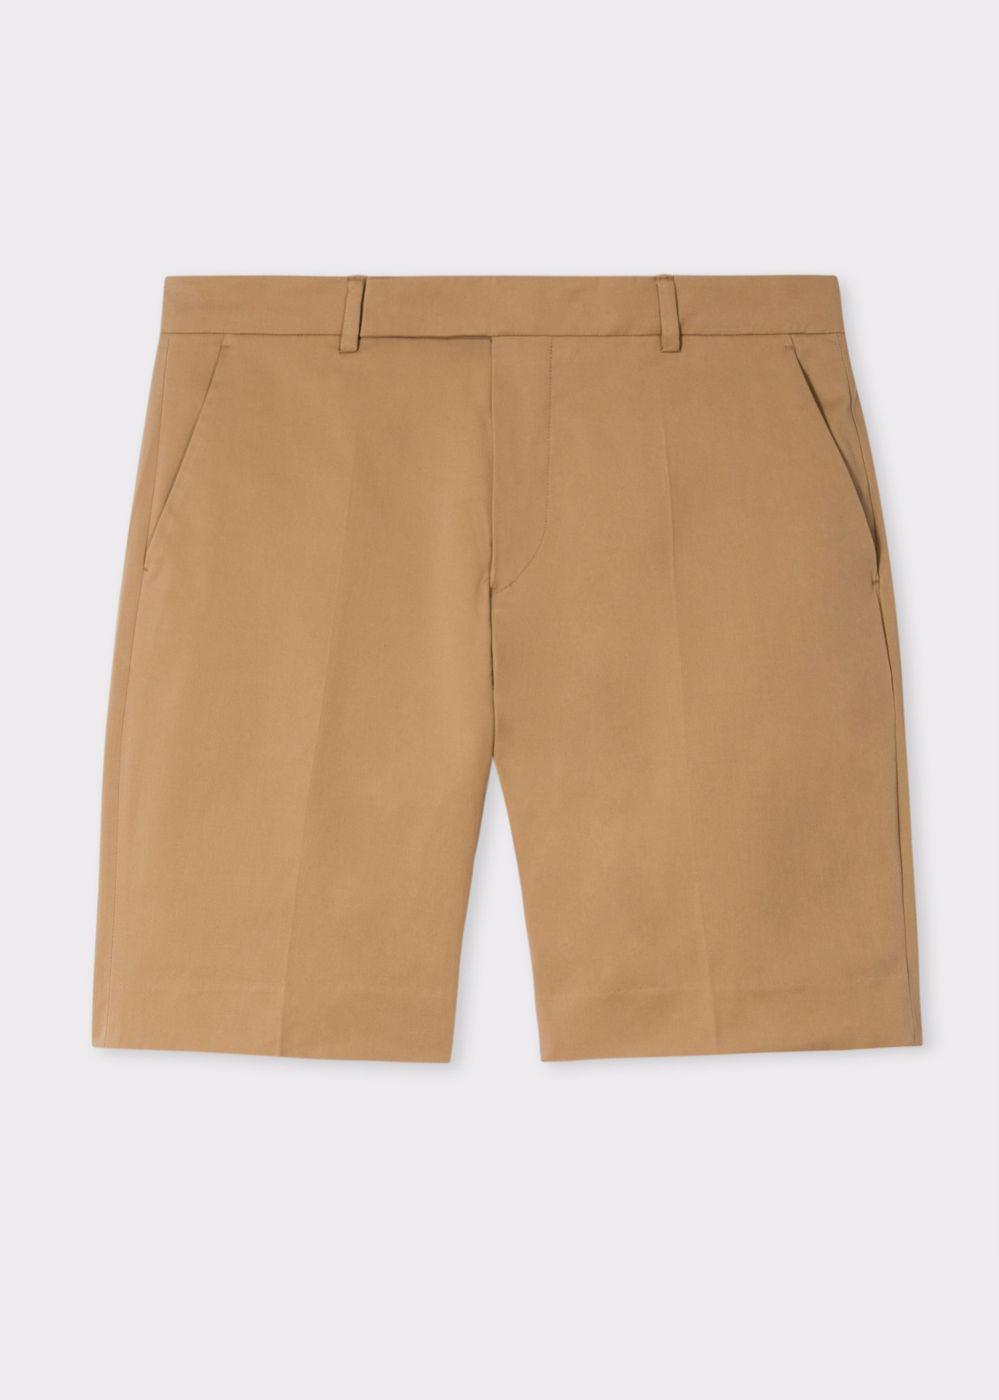 f5668f9dc9 Lyst - Paul Smith Men's Tan Stretch Cotton-twill Shorts for Men